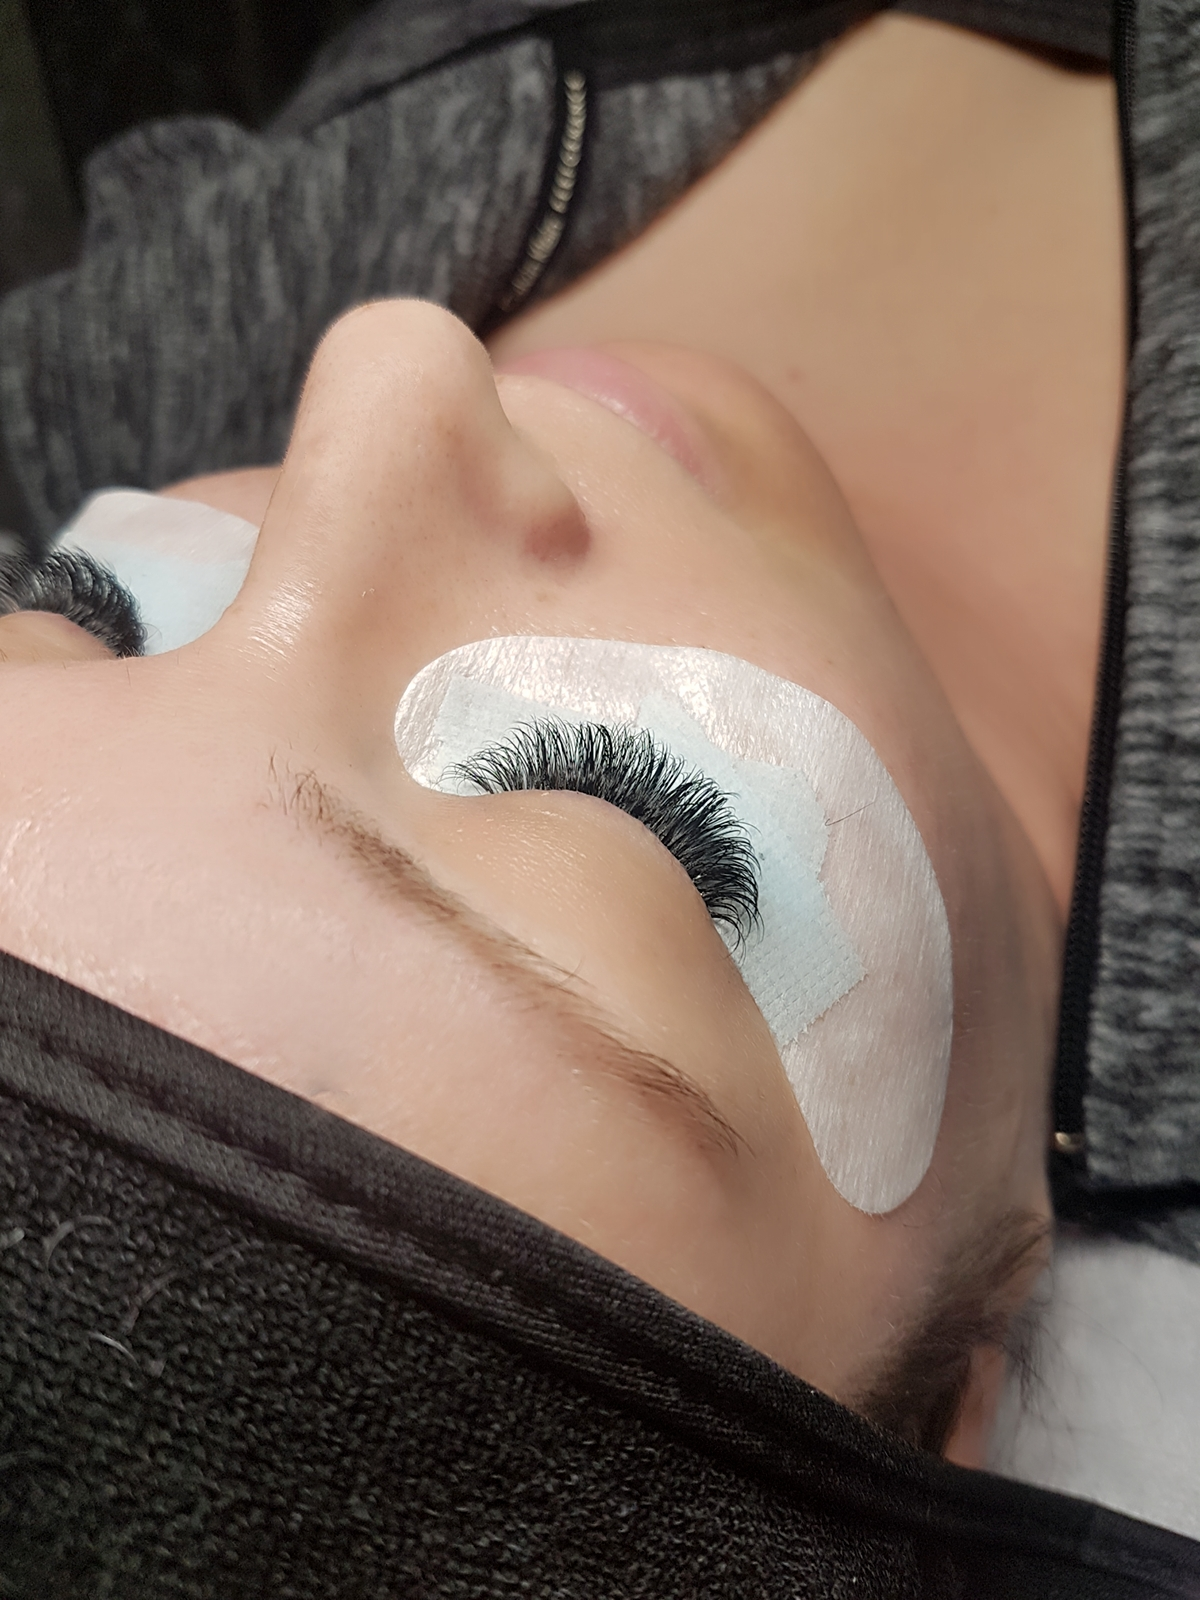 BeautyPlus_20181010153810_save.jpg